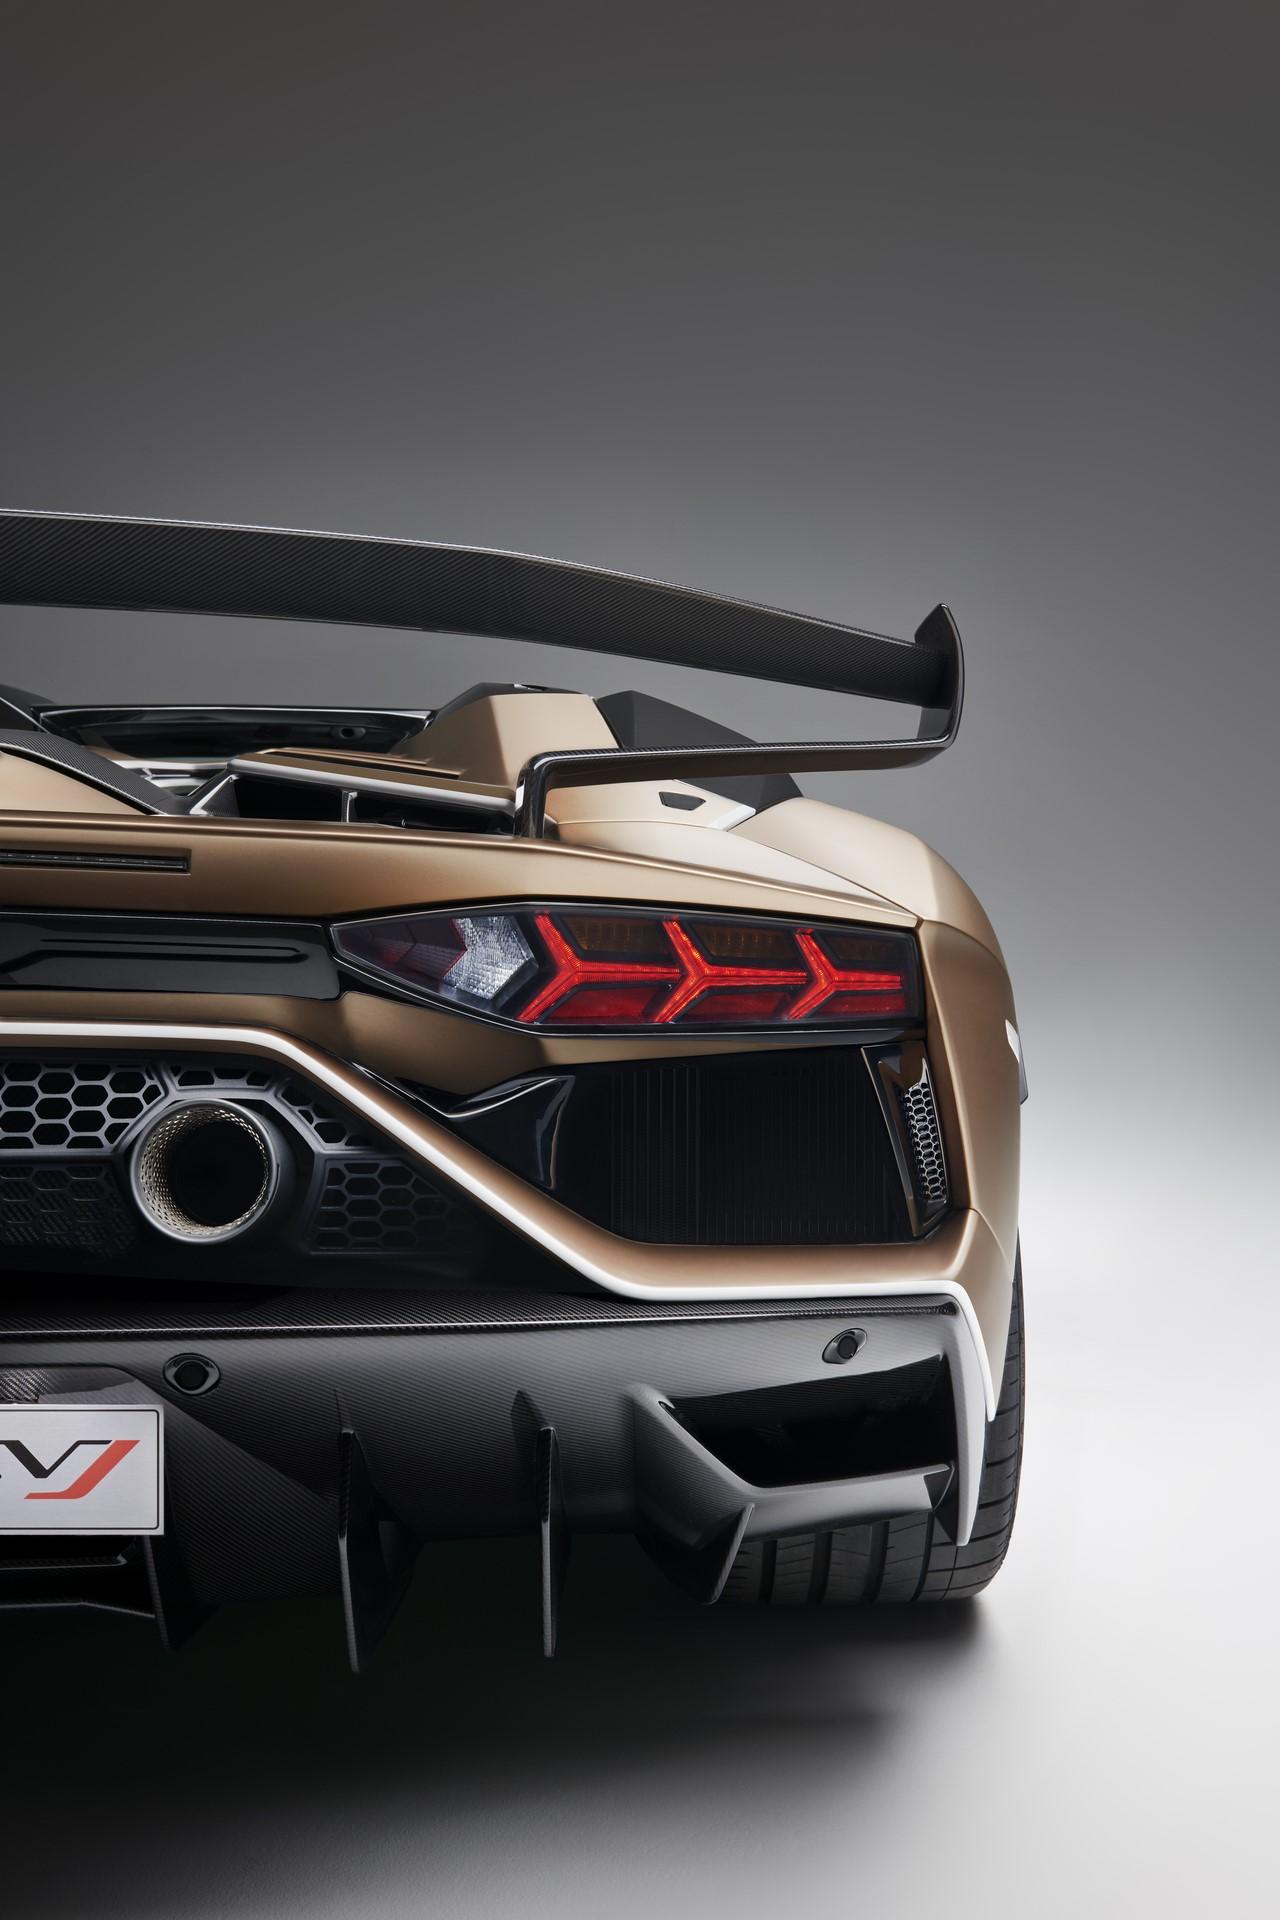 Lamborghini Aventador SVJ Roadster (32)